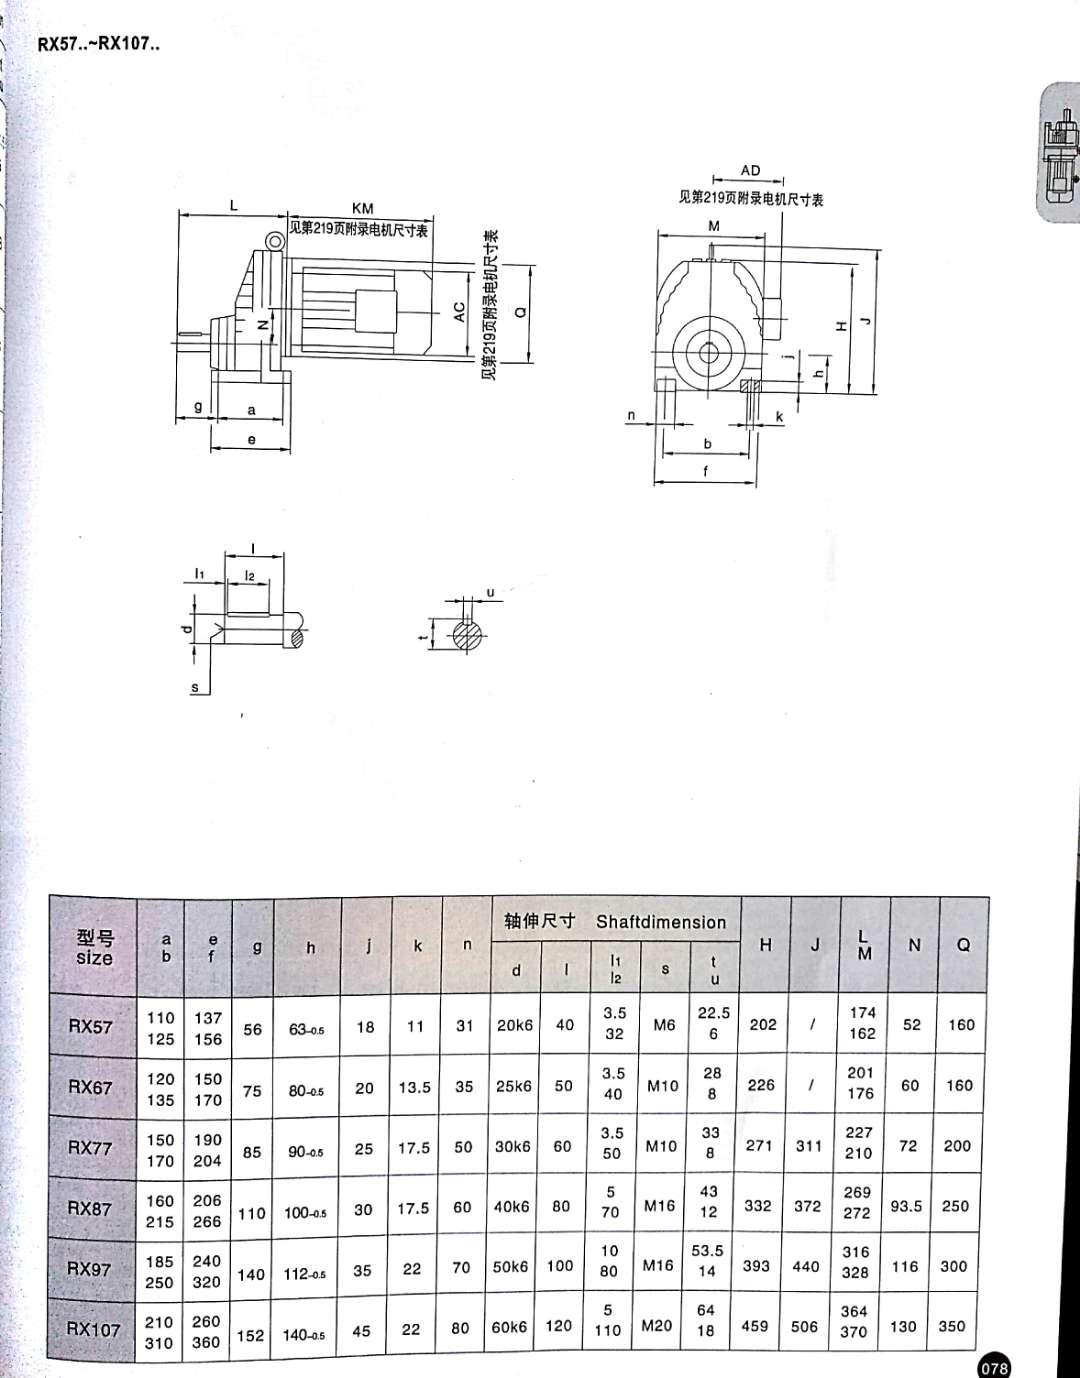 R系列斜齿轮硬齿面减速机-R系列斜齿轮硬齿面减速机-洛阳子杰传动设备有限公司